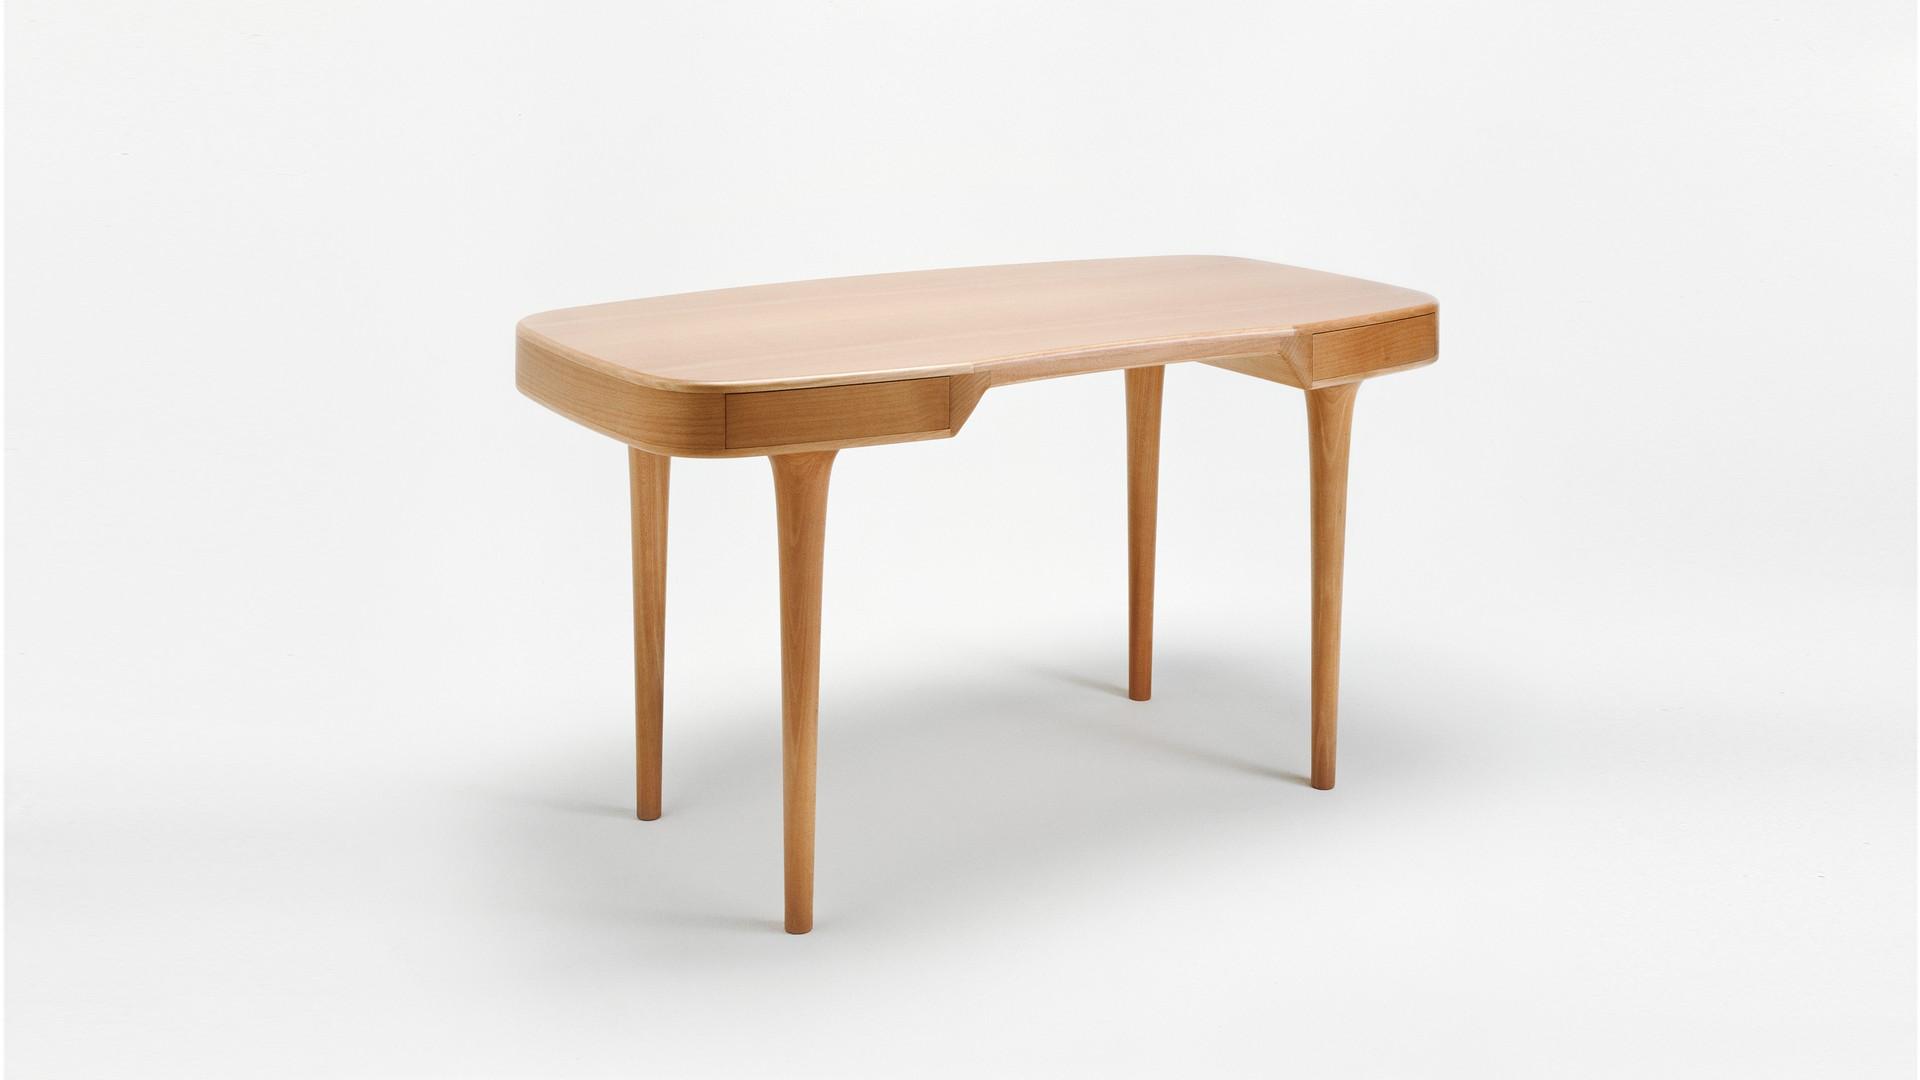 Marc newson desk best home design 2018 for Furniture in riga